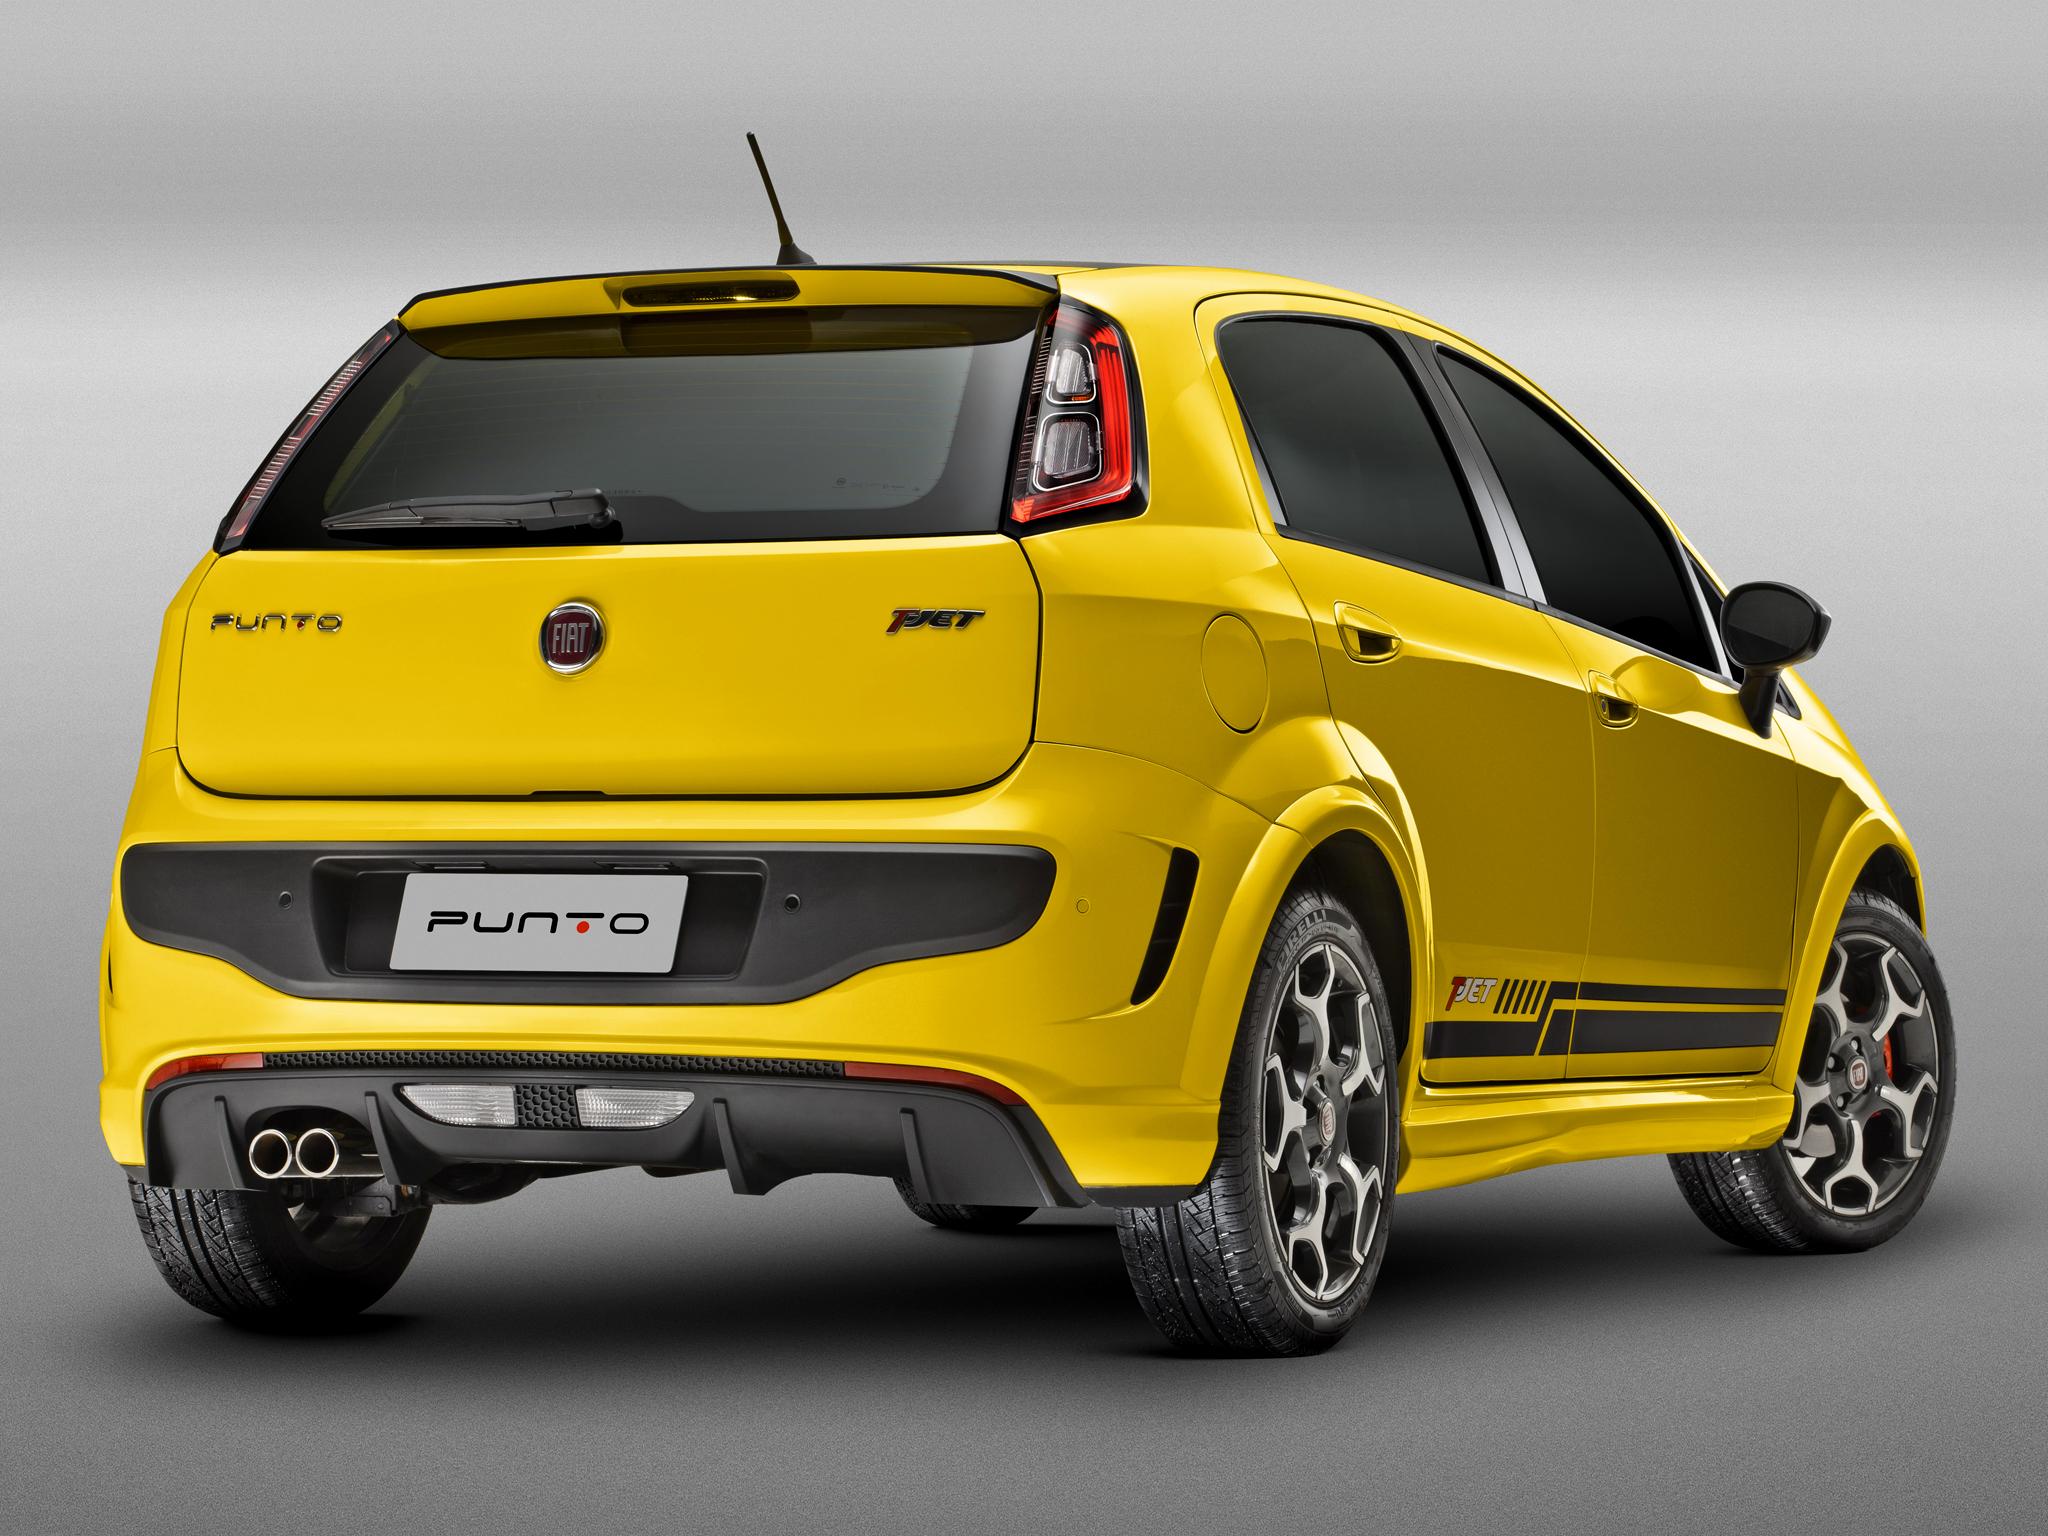 Fiat Punto T Jet on palio t jet, bravo t jet, linea t jet,